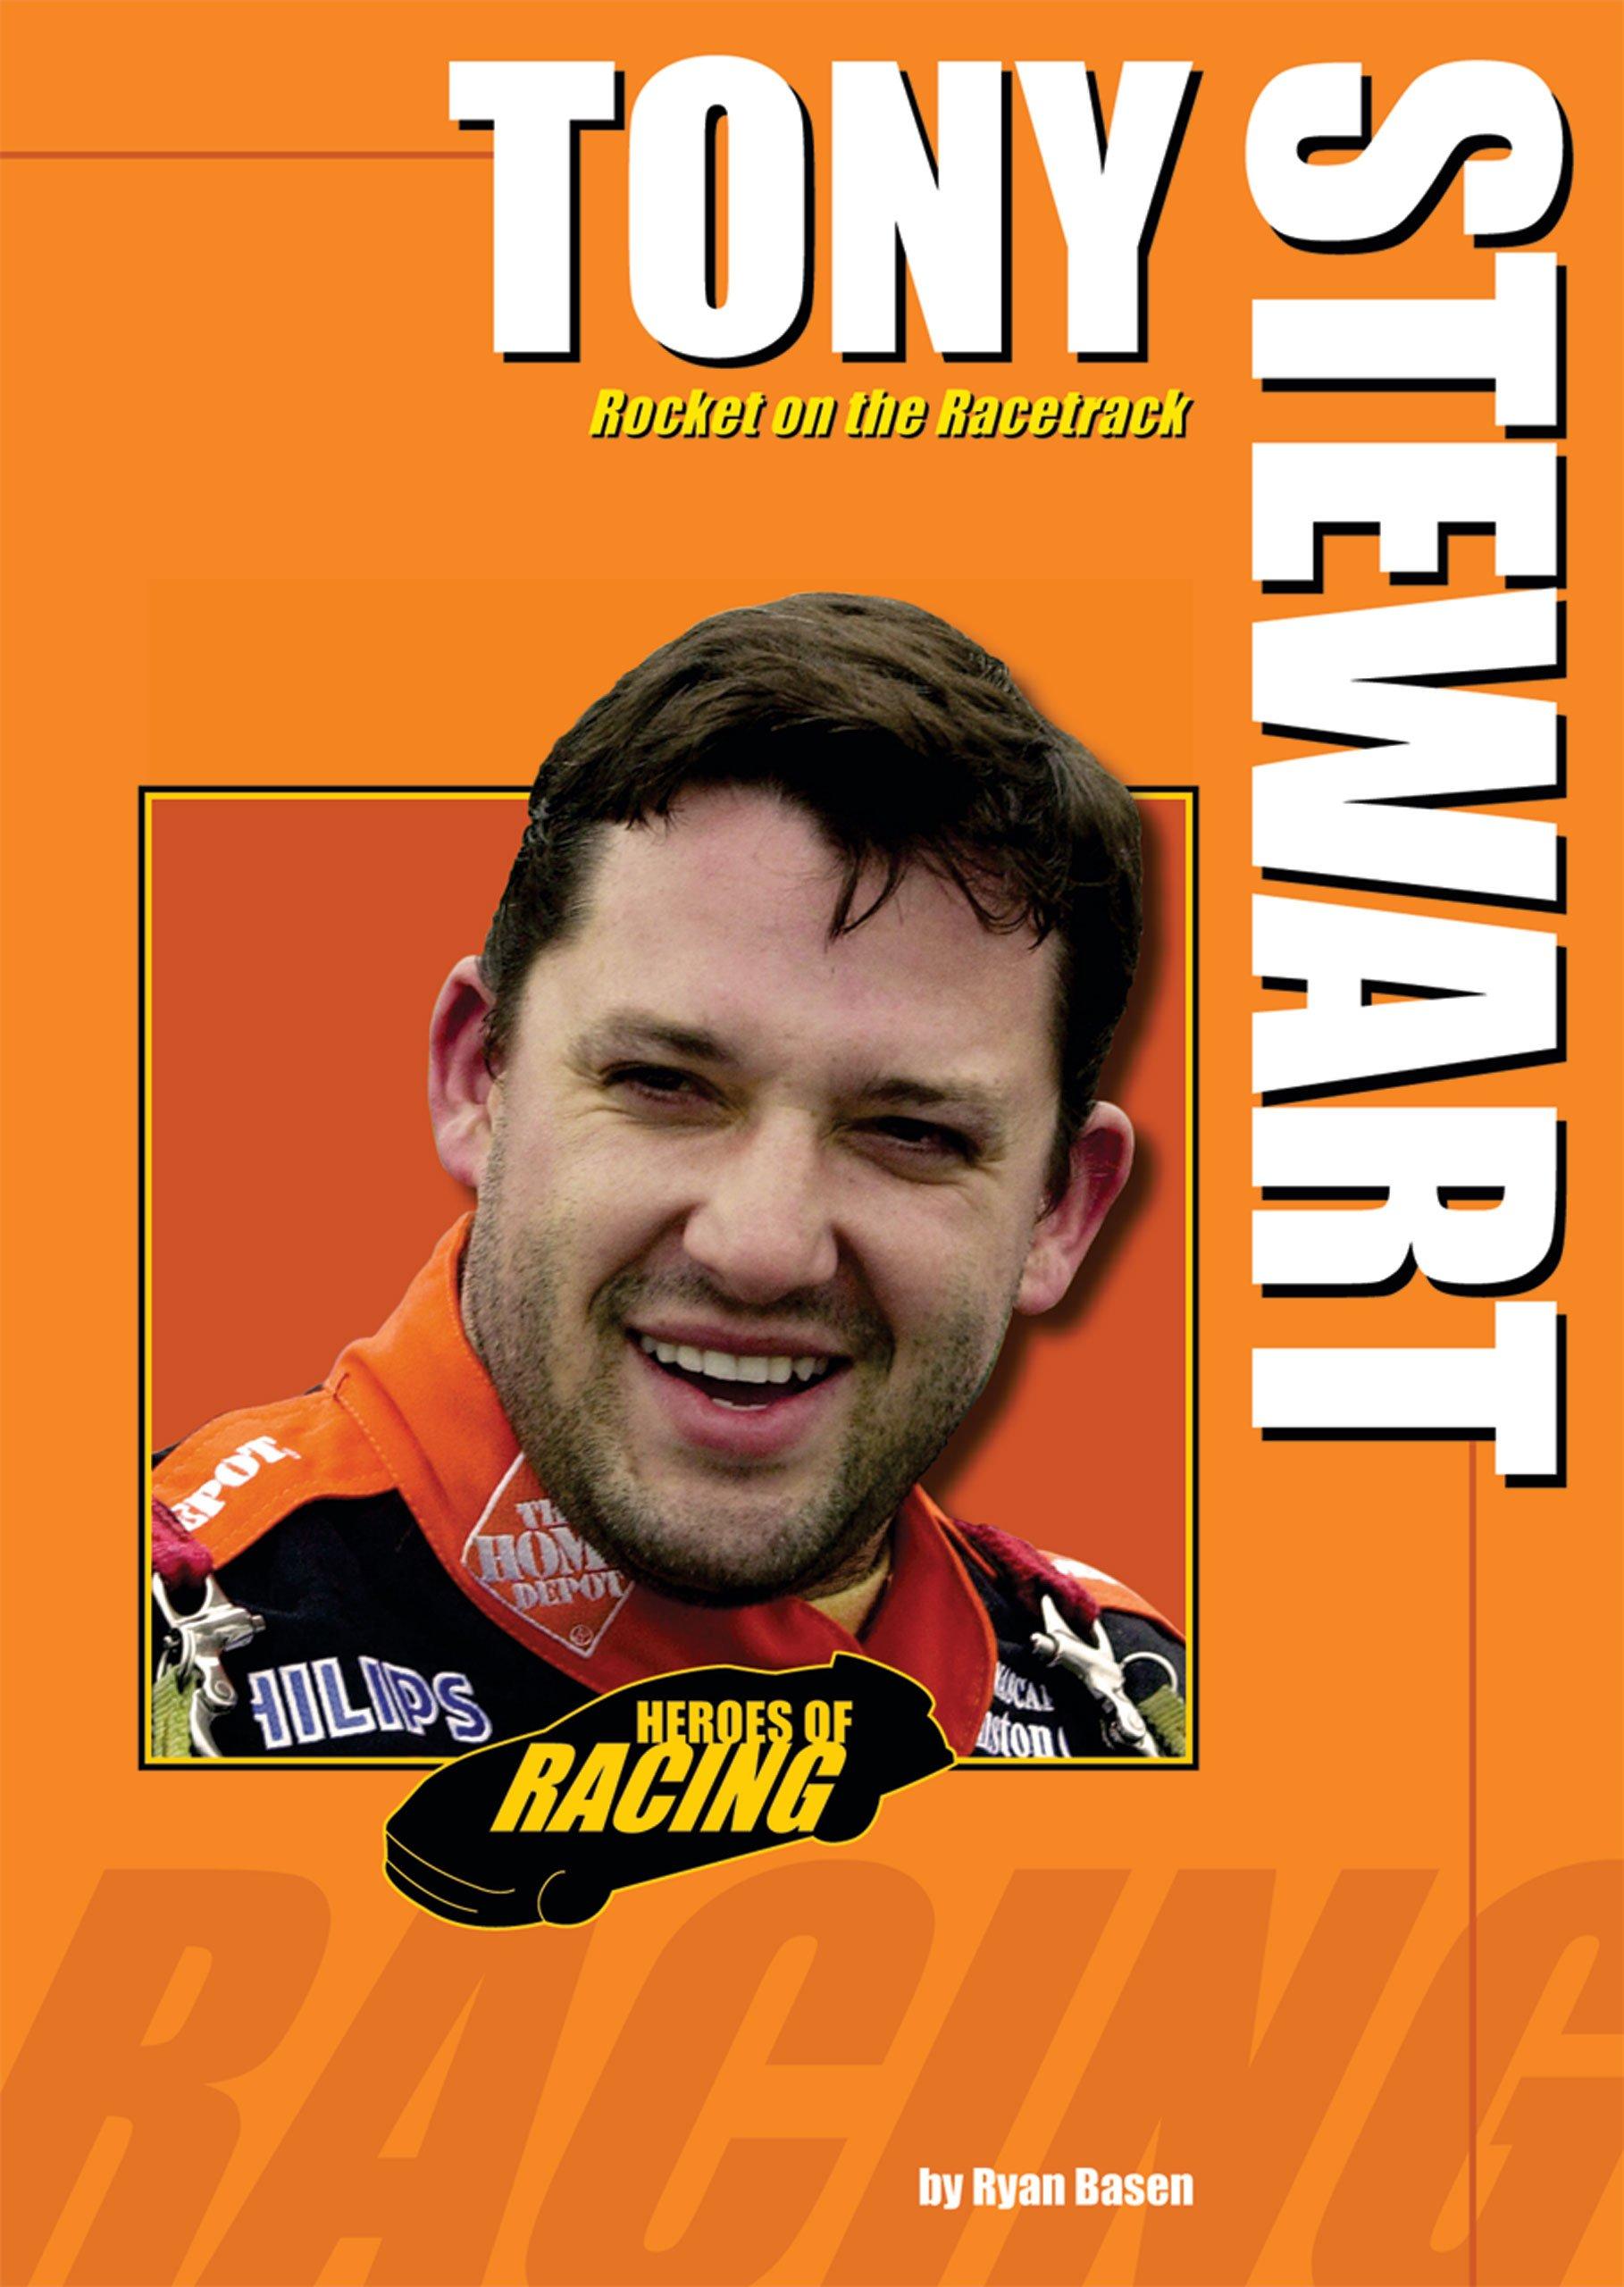 Tony Stewart: Rocket on the Racetrack (Heroes of Racing)